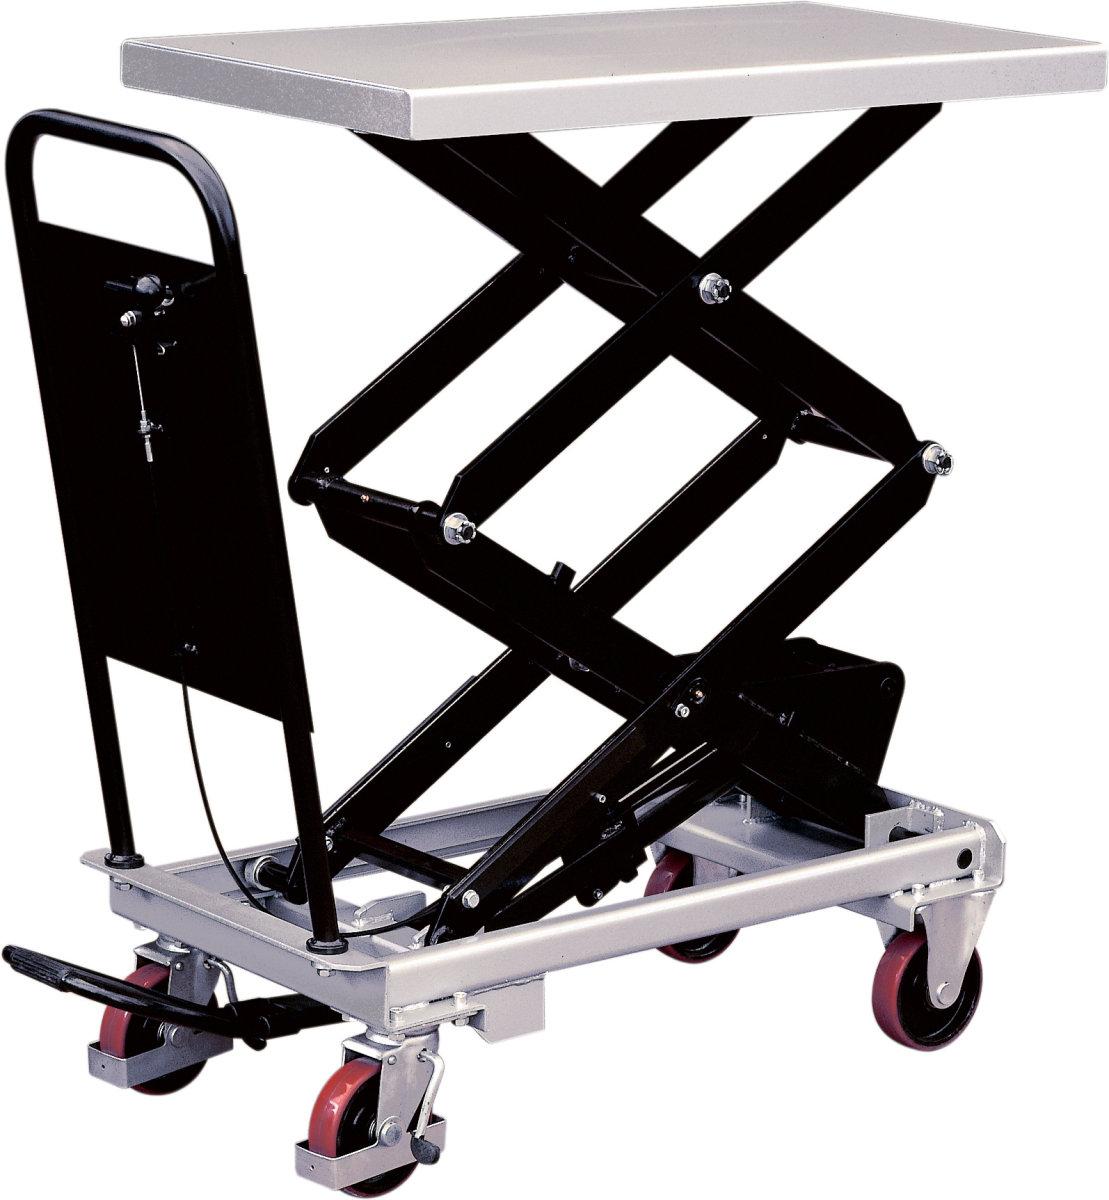 Silverstone mobilt løftebord, 800 kg, 470-1410 mm